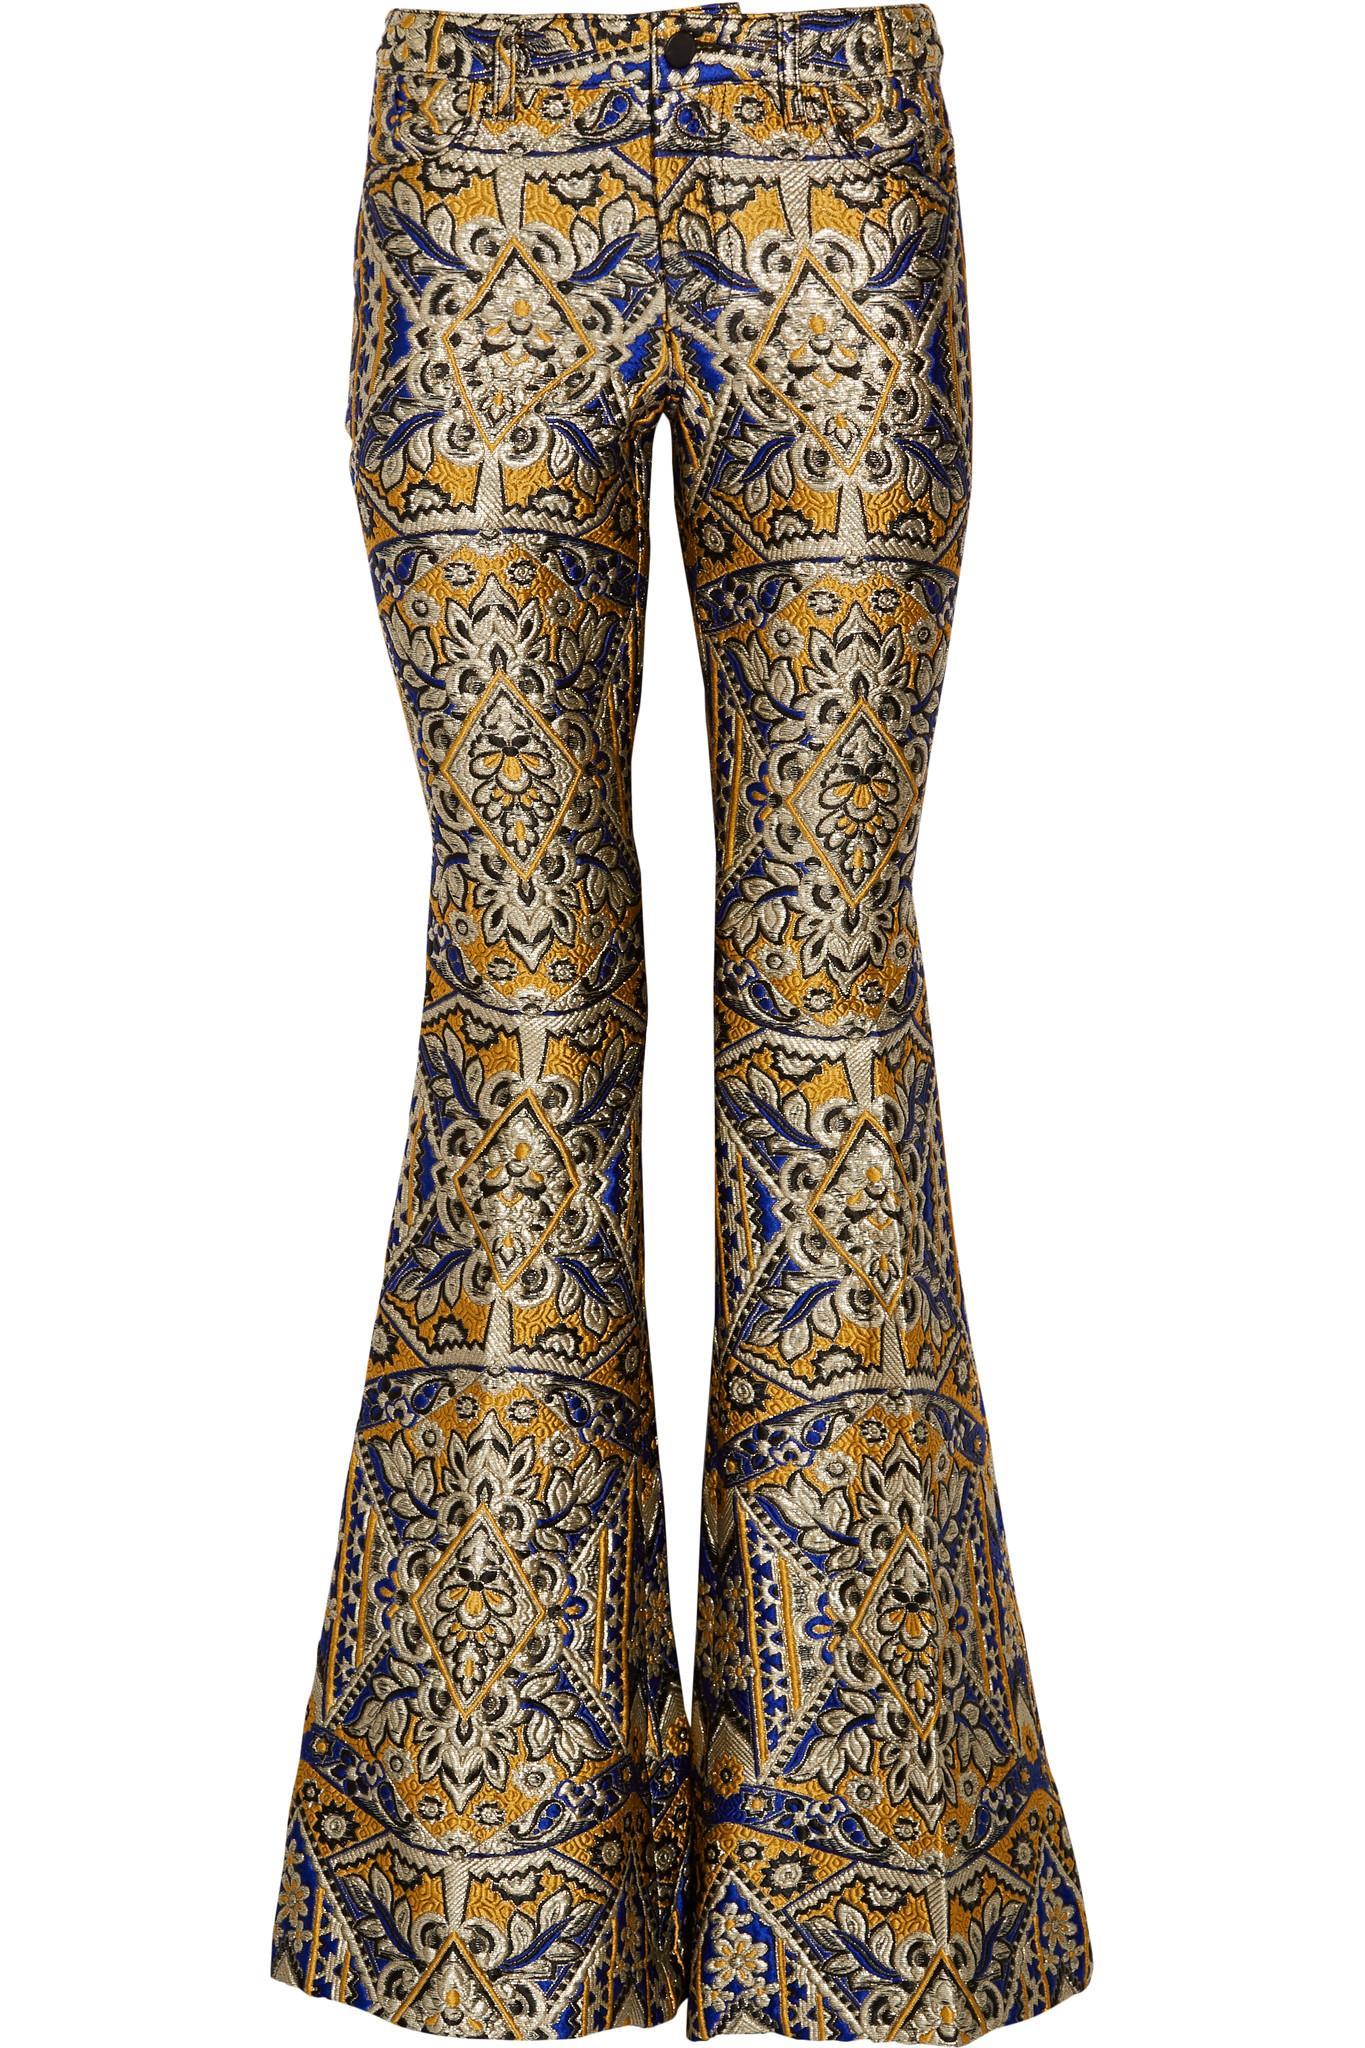 Alice Olivia Metallic Brocade Flared Pants In Metallic